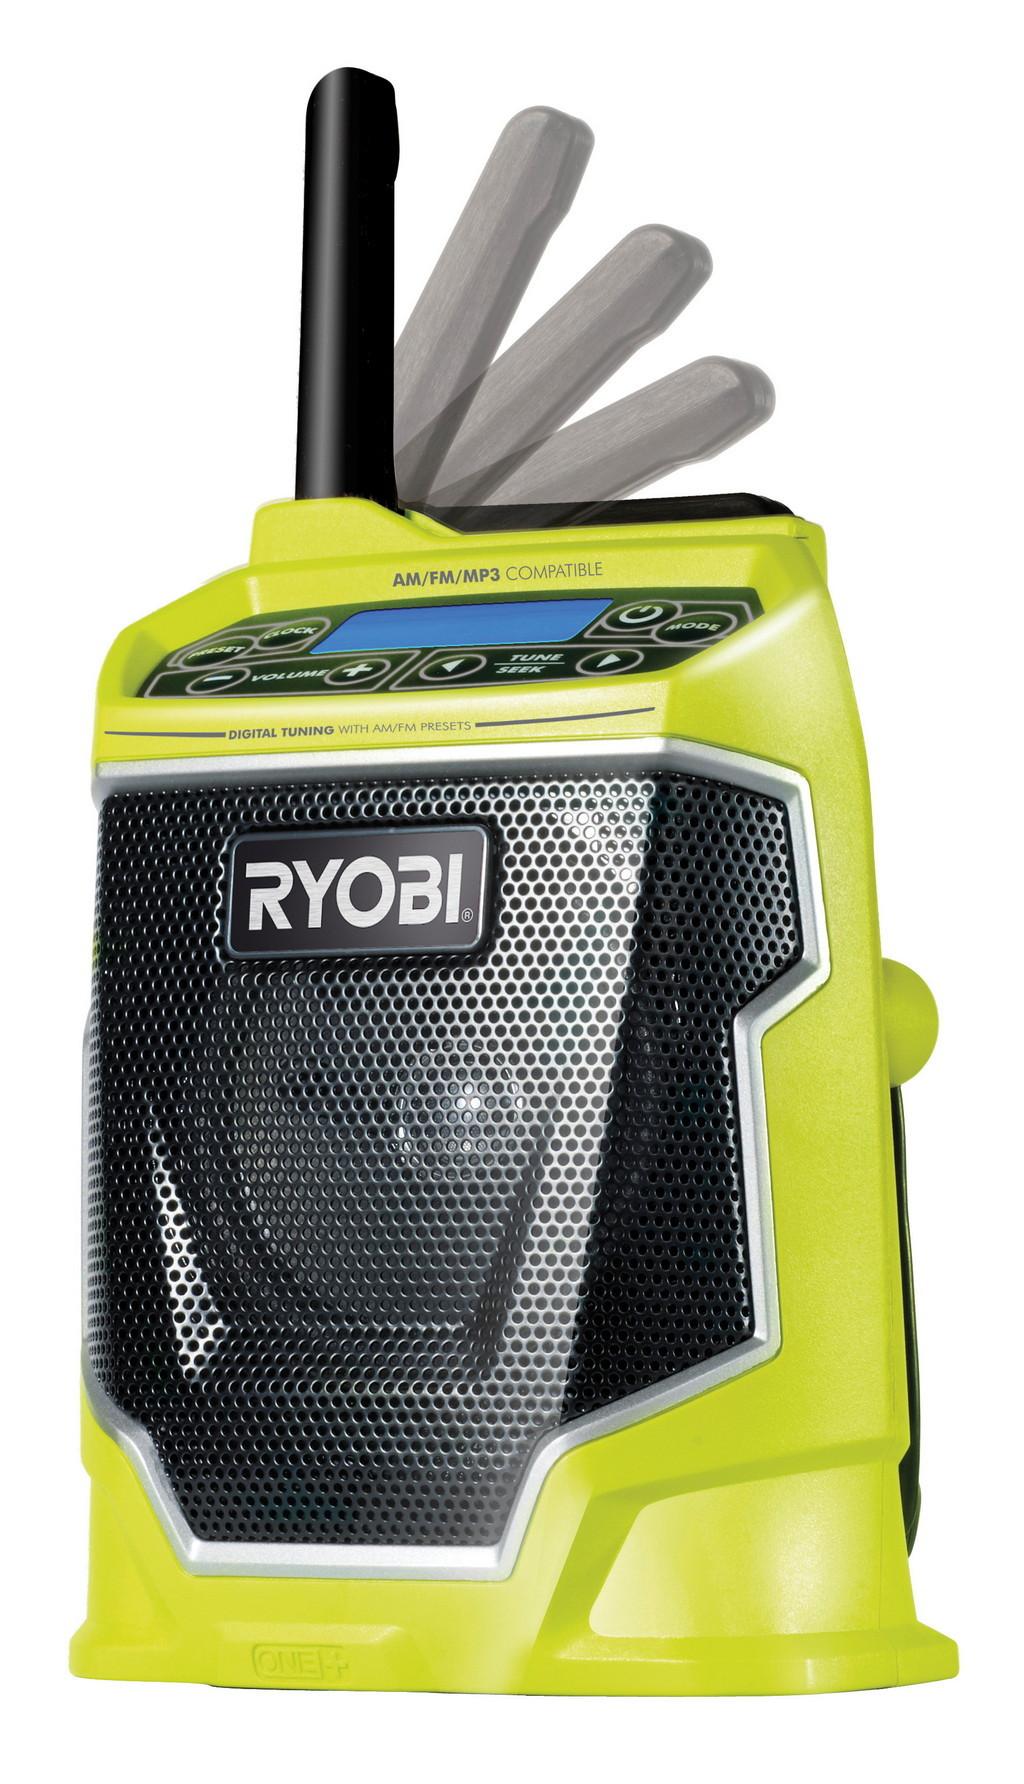 Ryobi CDR 180 M